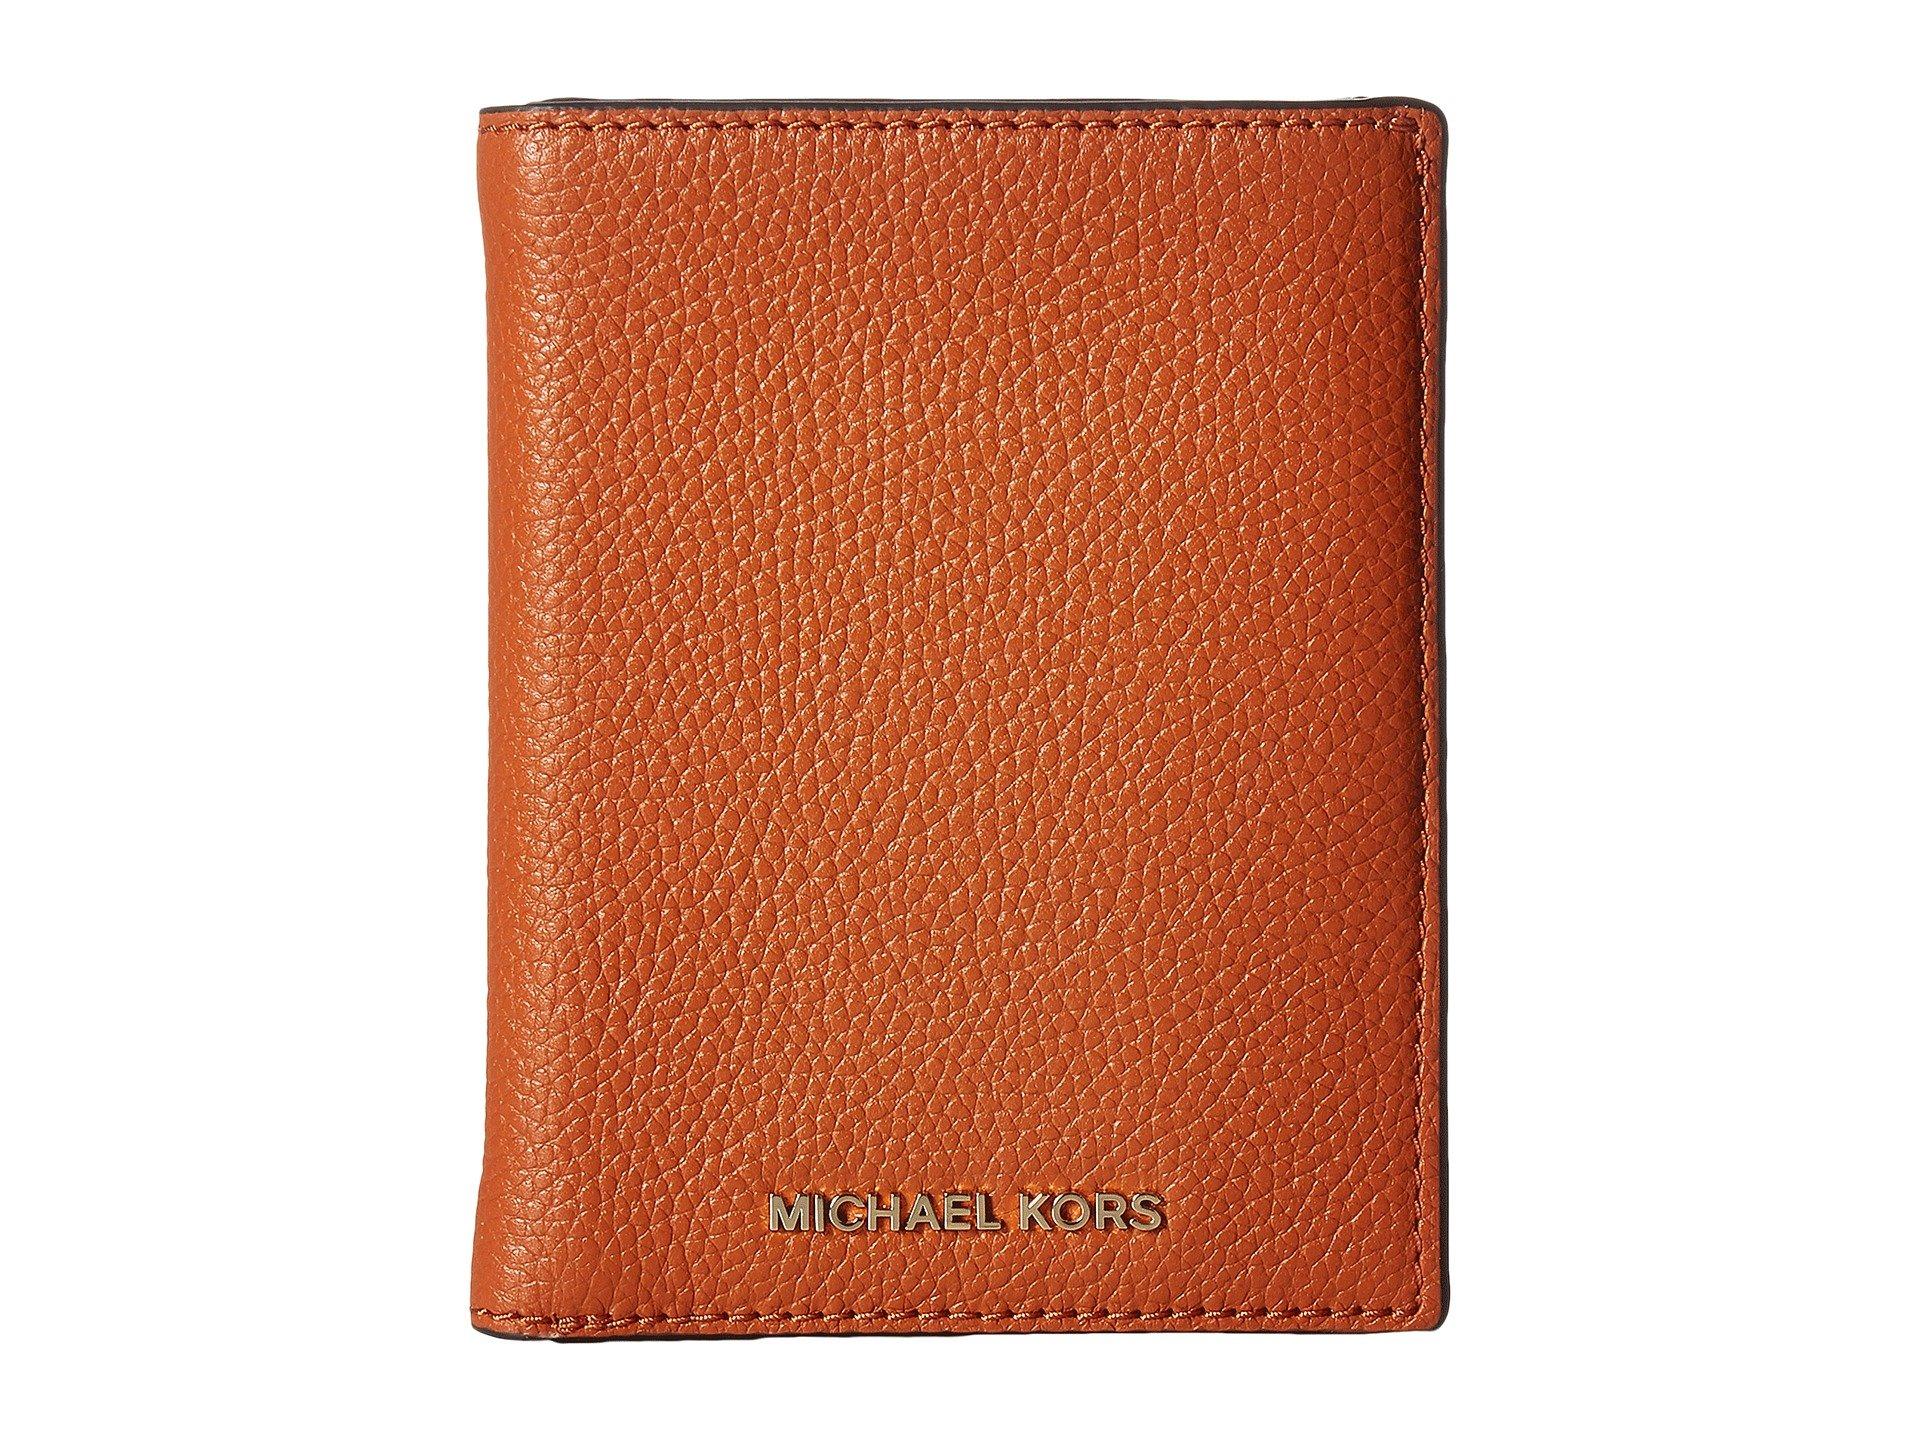 Bolso Accesorio de Viaje para Mujer MICHAEL Michael Kors Mercer Passport Wallet  + Michael Kors en VeoyCompro.net